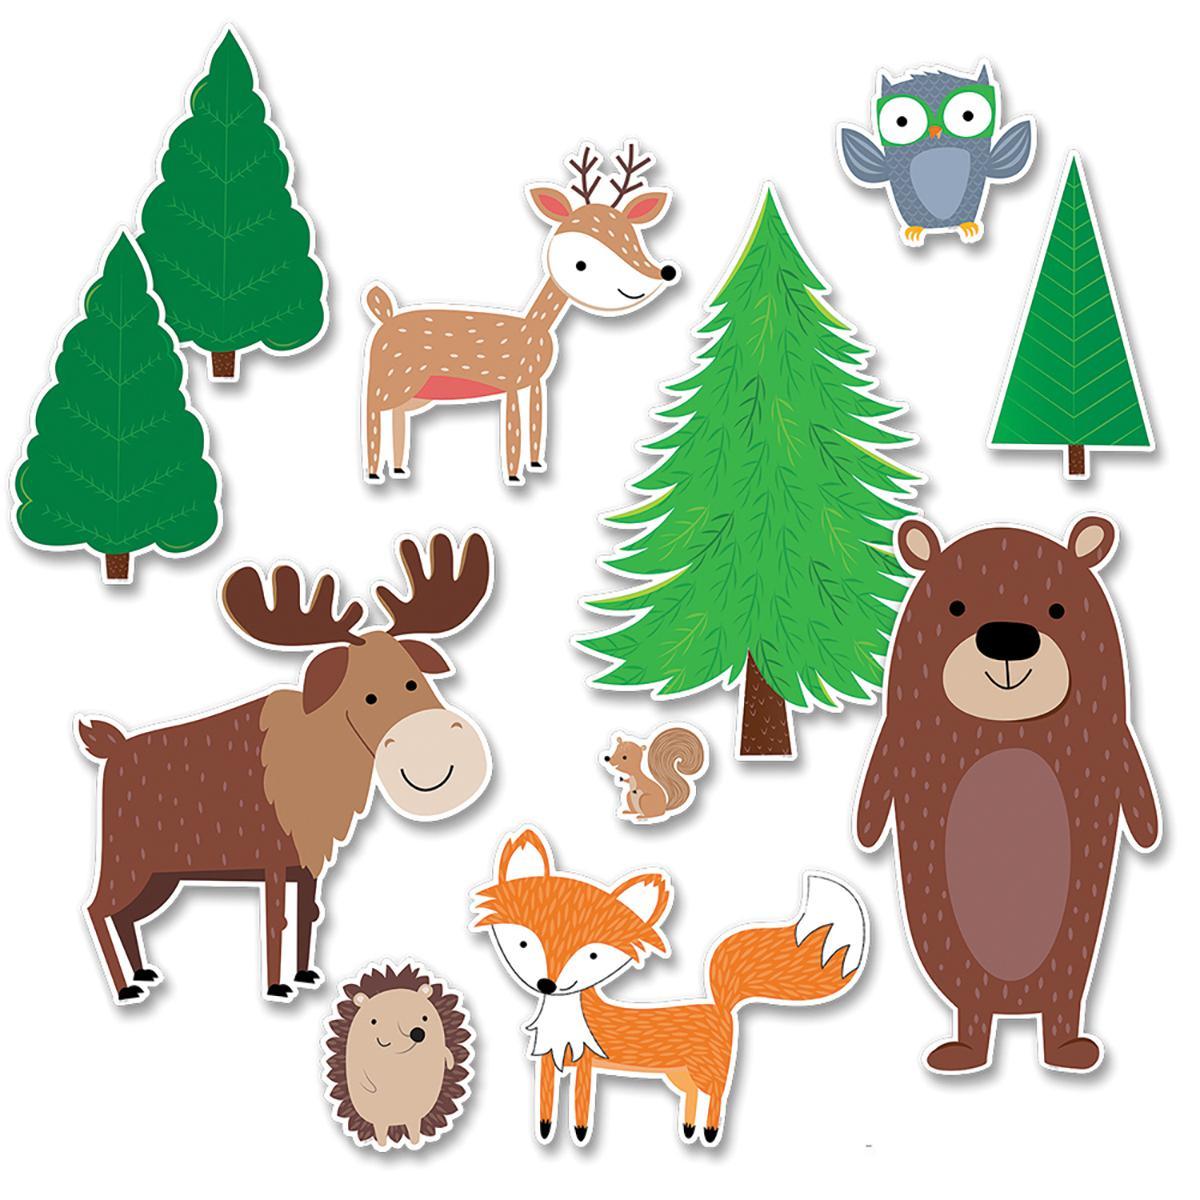 Jumbo Woodland Friends Bulletin Board Set